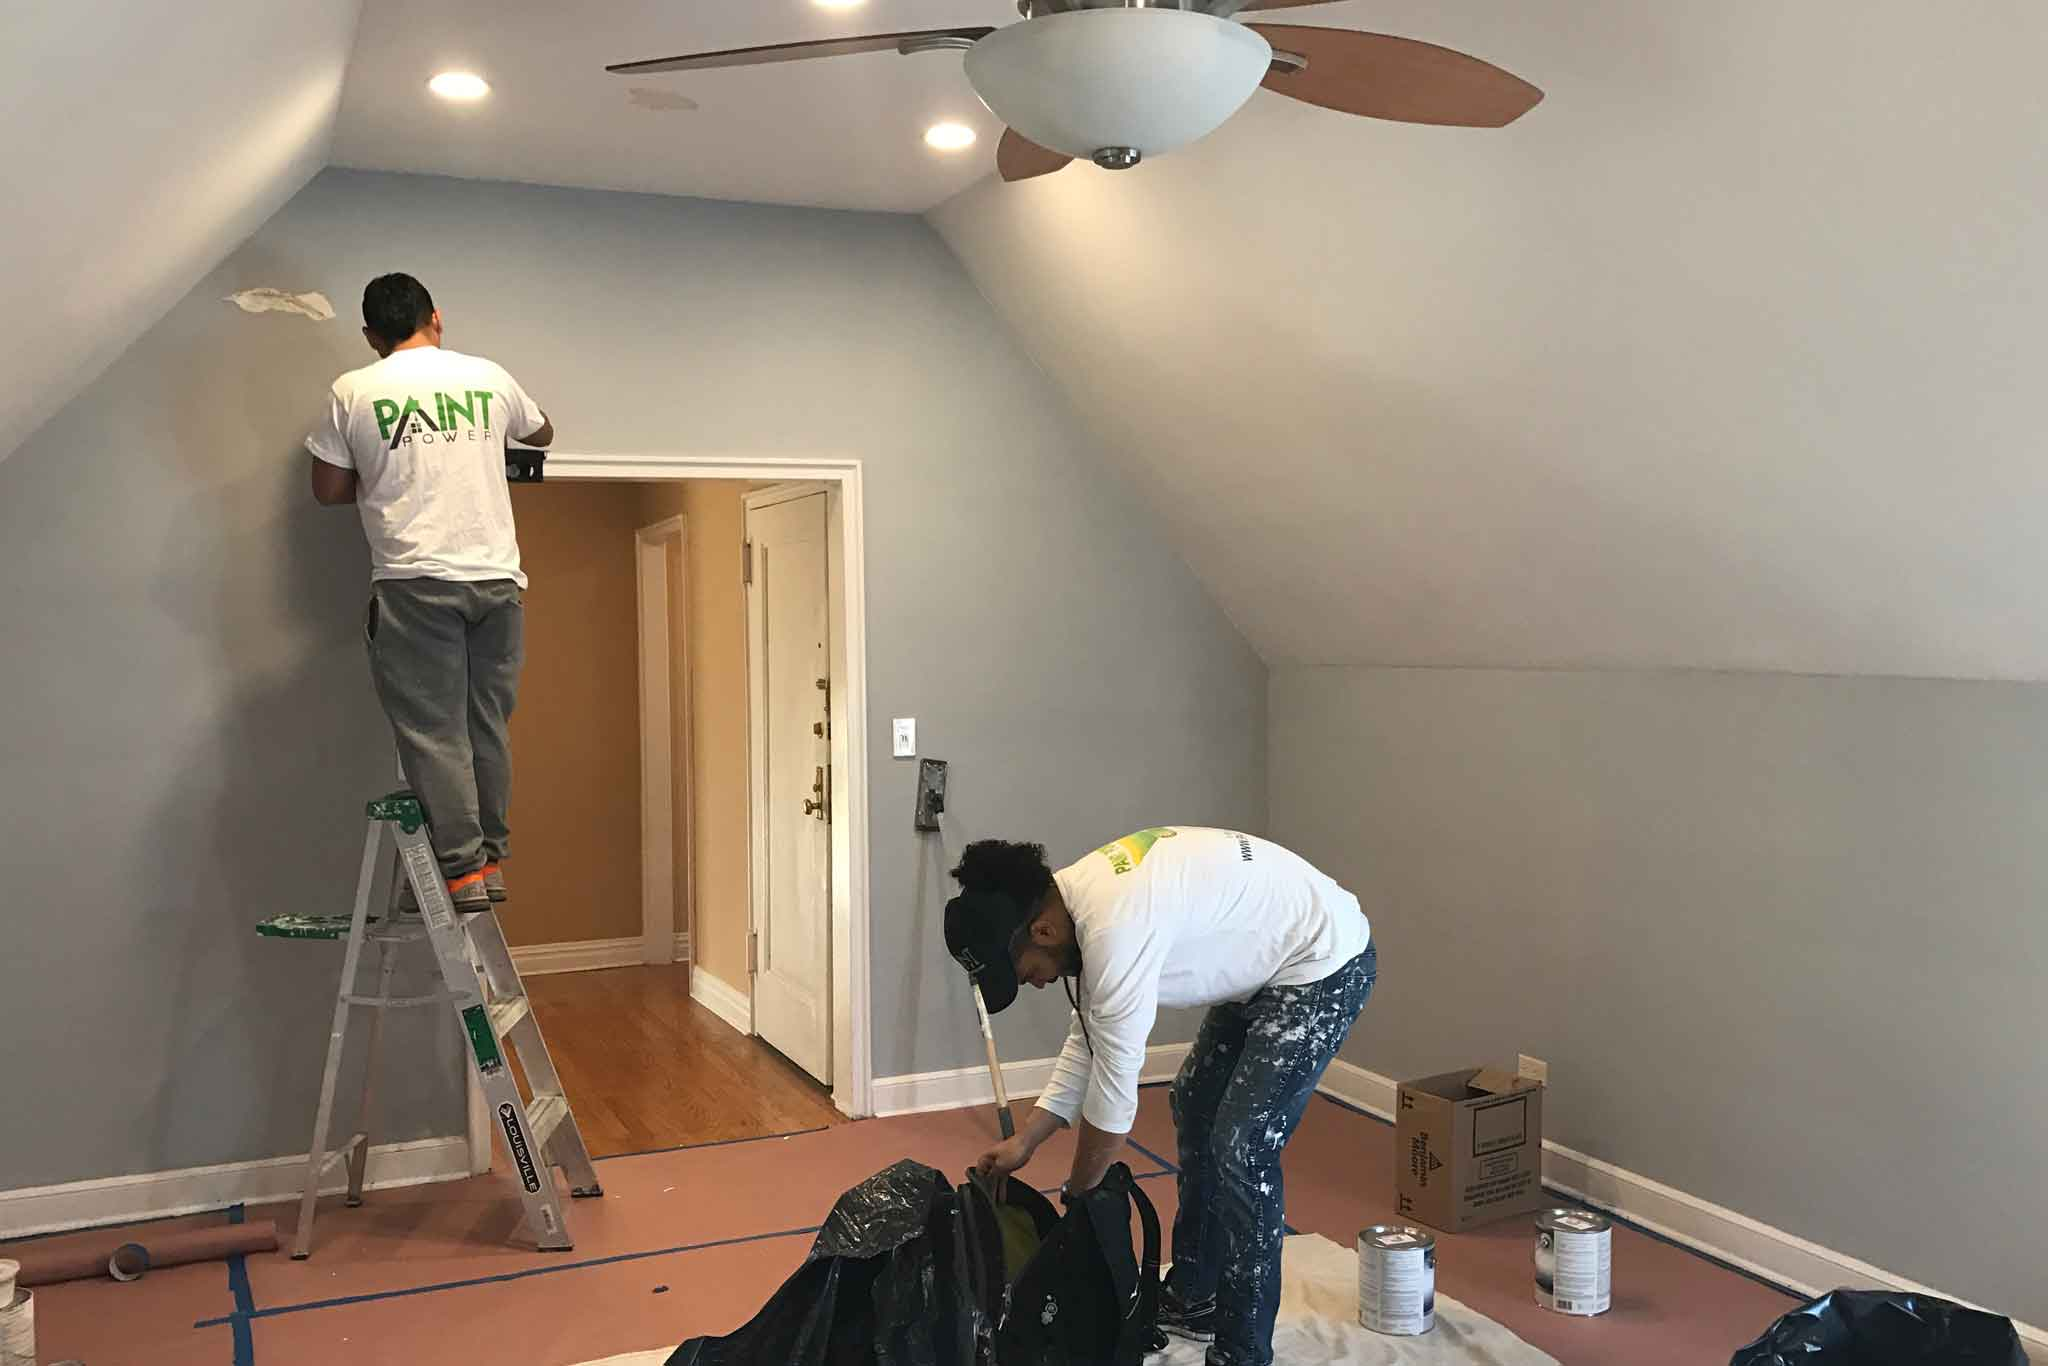 https://nassau.paintpower.net/wp-content/uploads/2021/07/painting-services-nassau-county.jpg